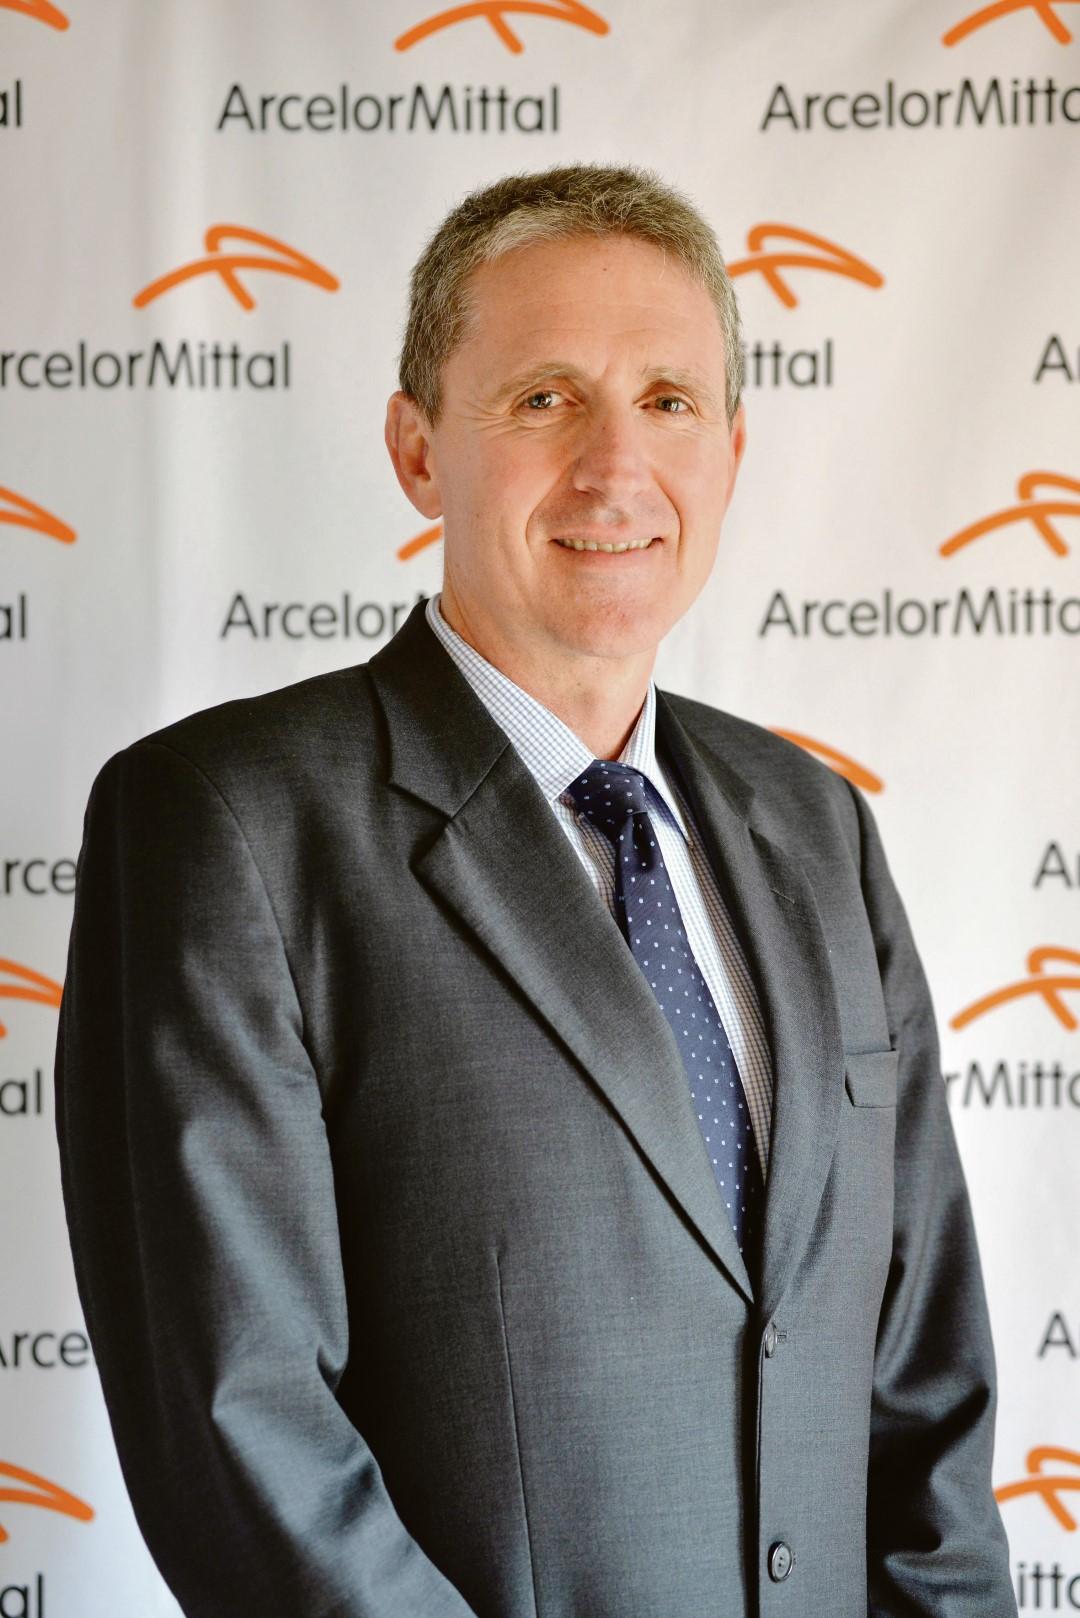 Mr Paul O' Flaherty, CEO of ArcelorMittal SA. Photo: A. Douwenga, Mardo Photos